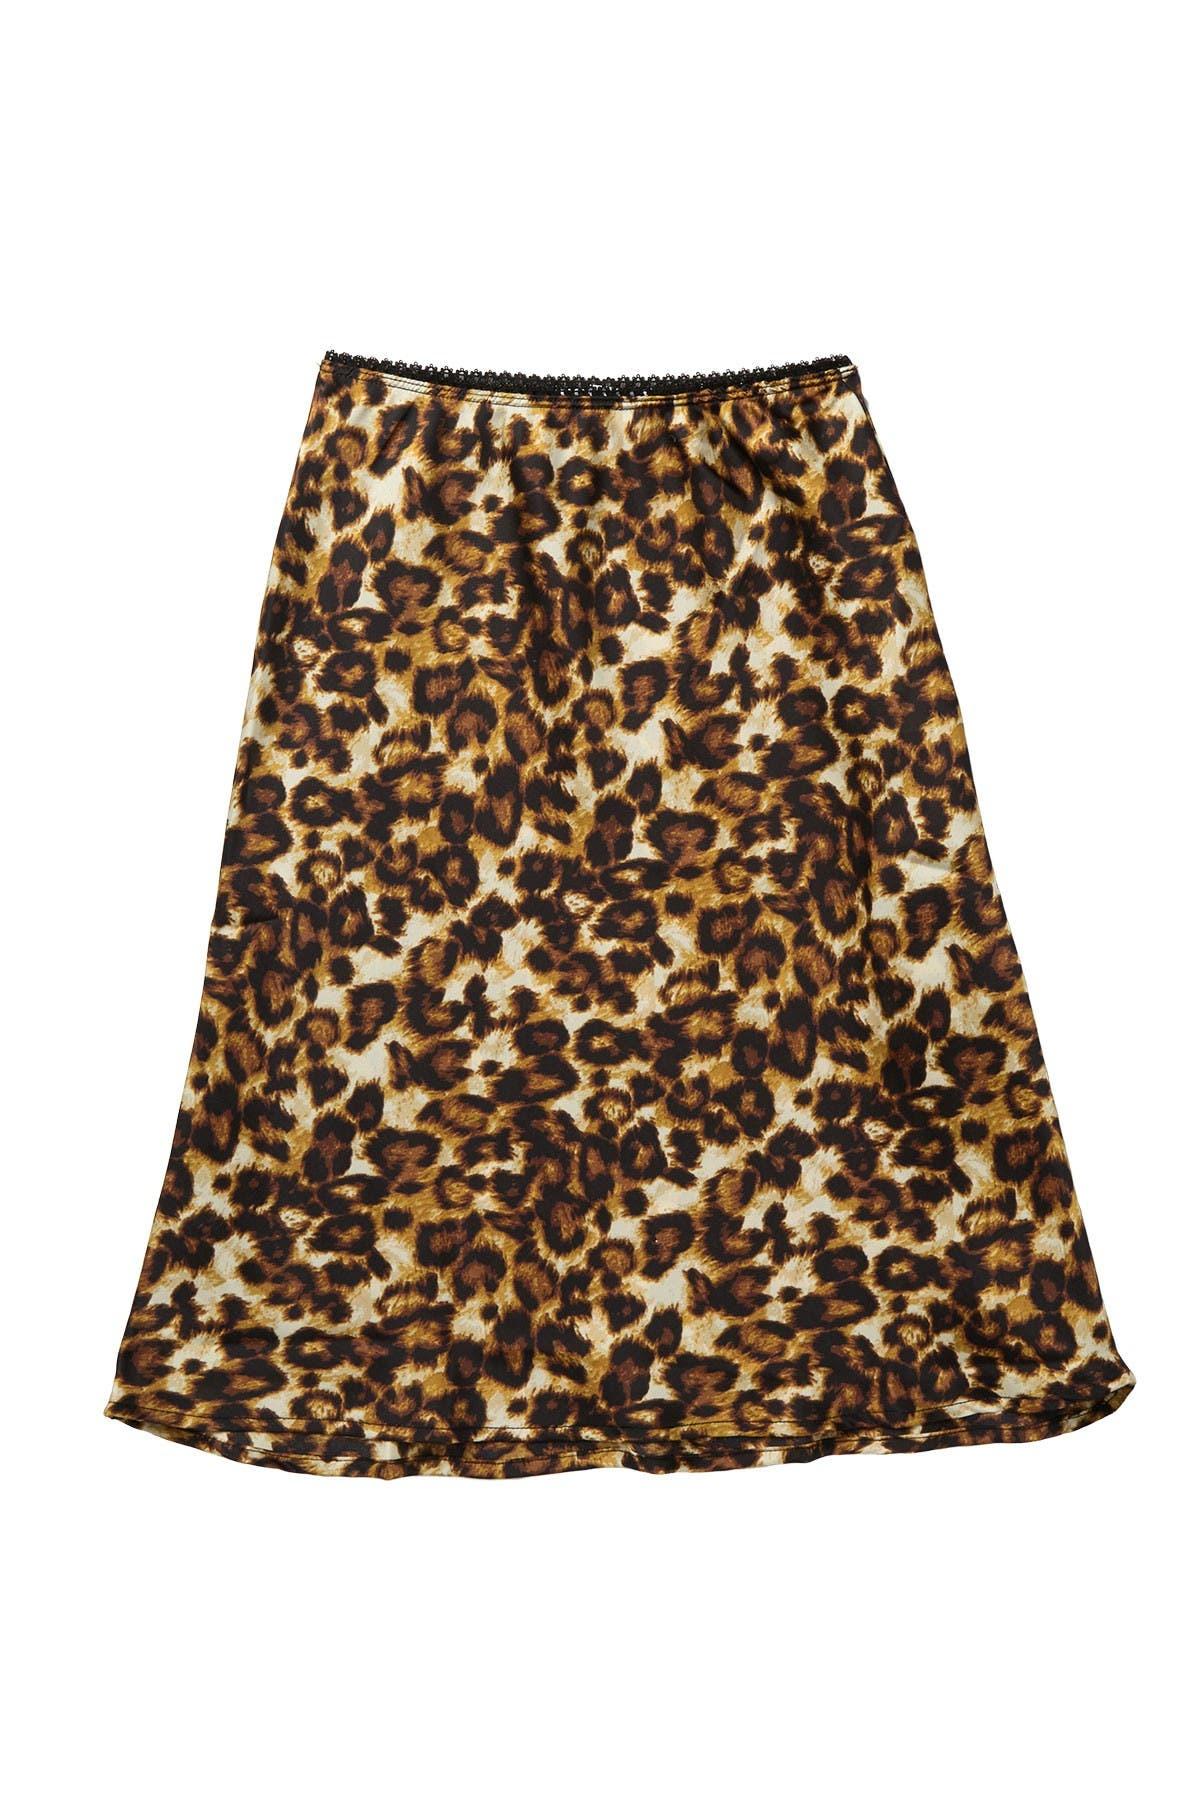 Image of Ten Sixty Sherman Leopard Print Skirt